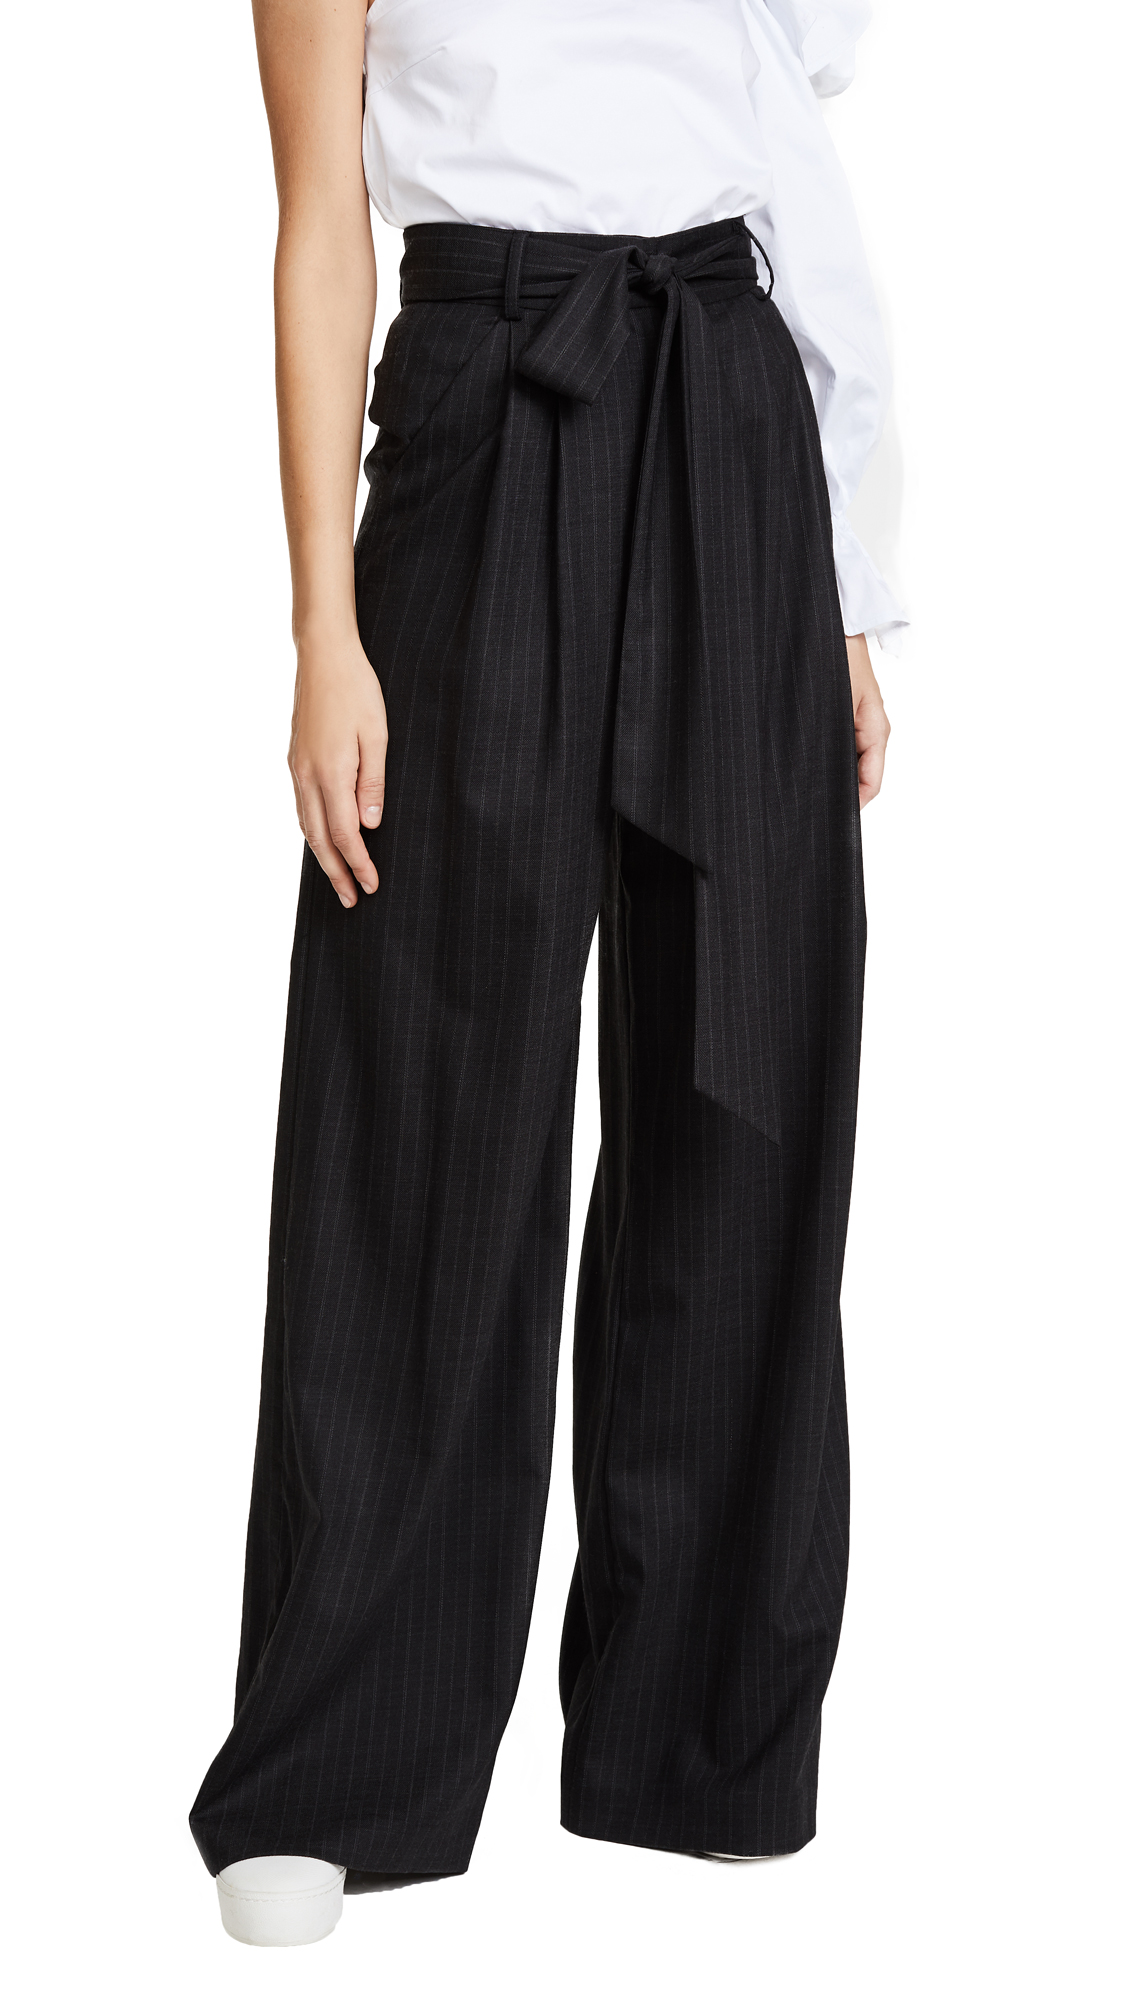 Milly Italian Pinstripe Natalie Pants - Grey Stripe